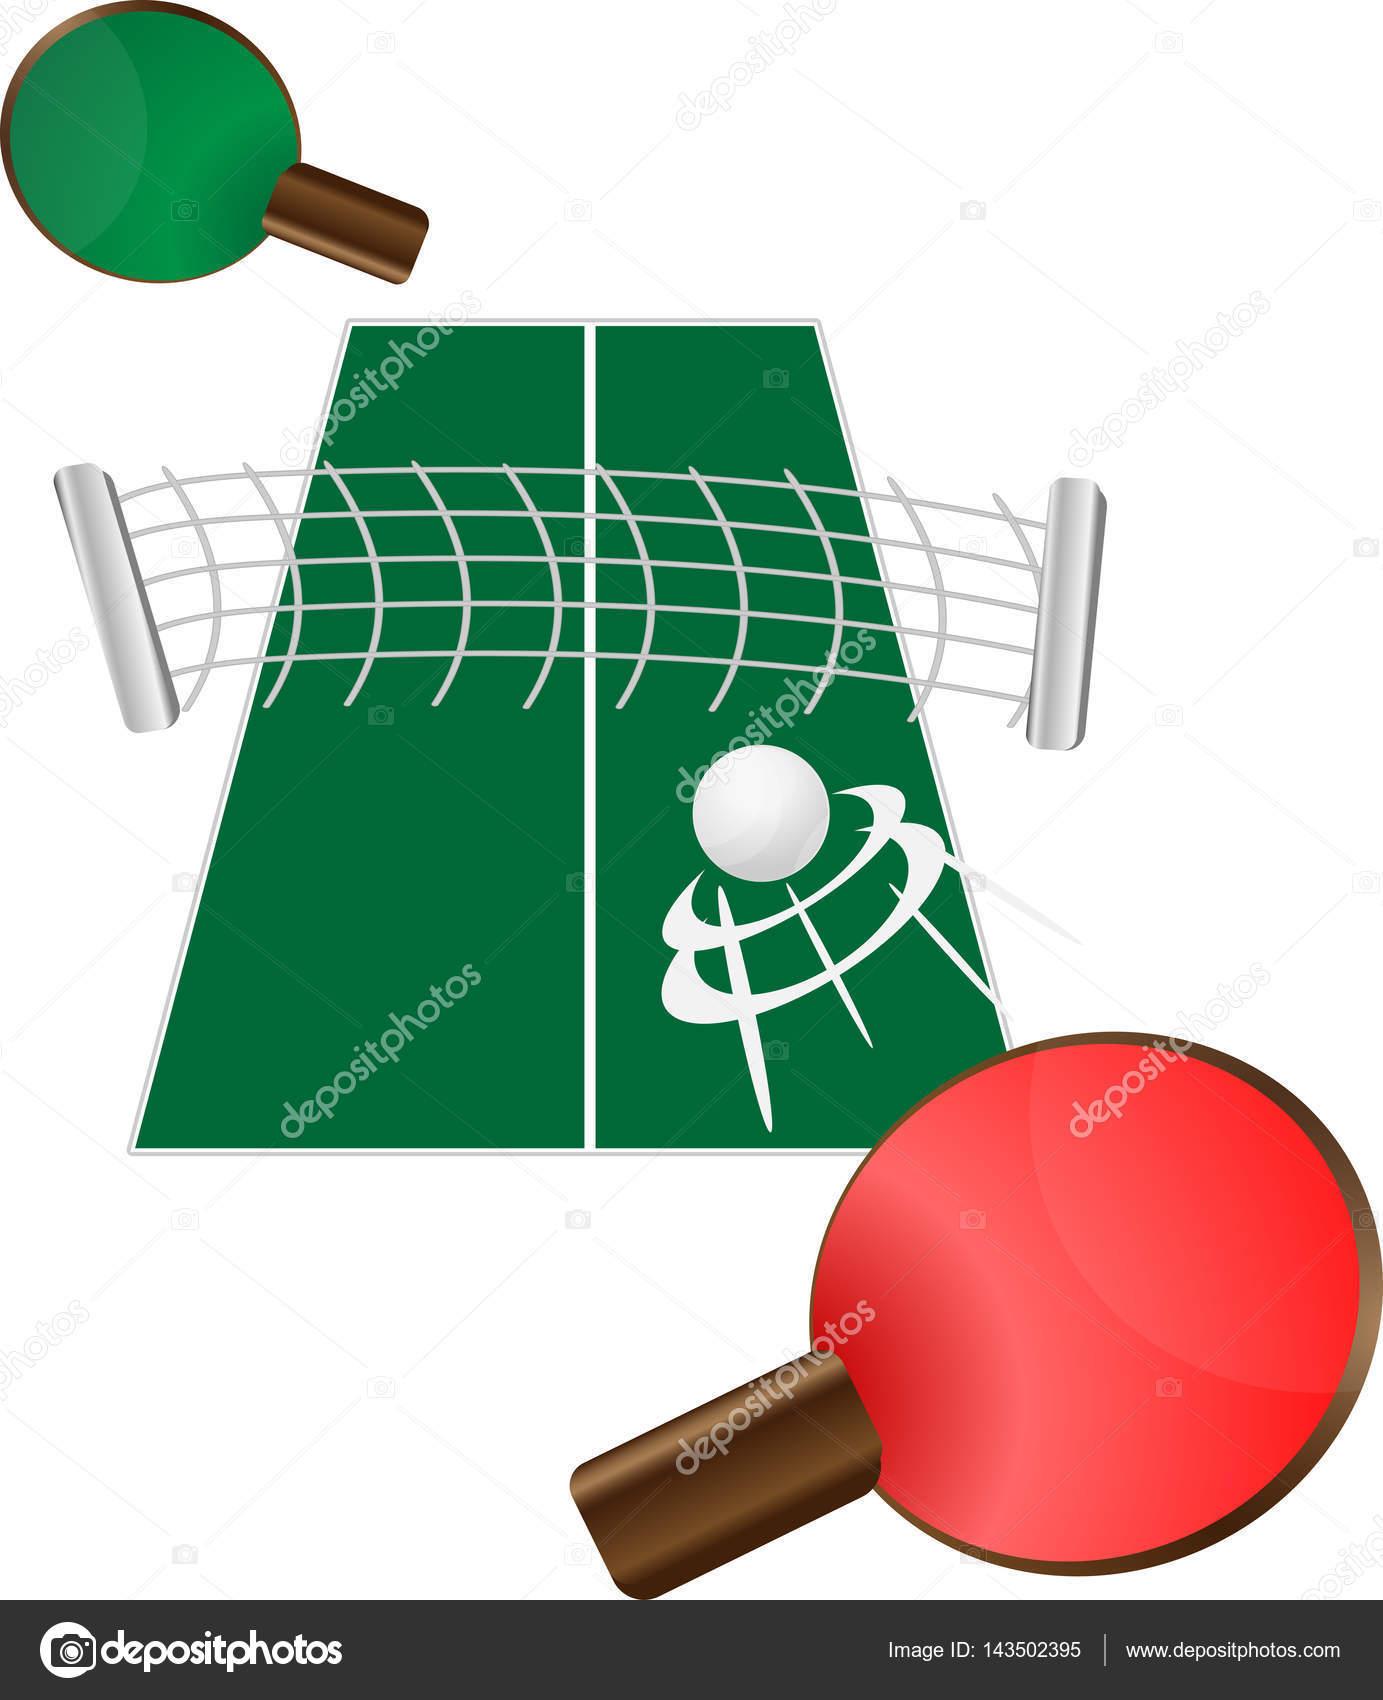 Tenis de mesa mesa de ping pong archivo im genes for Mesa tenis de mesa